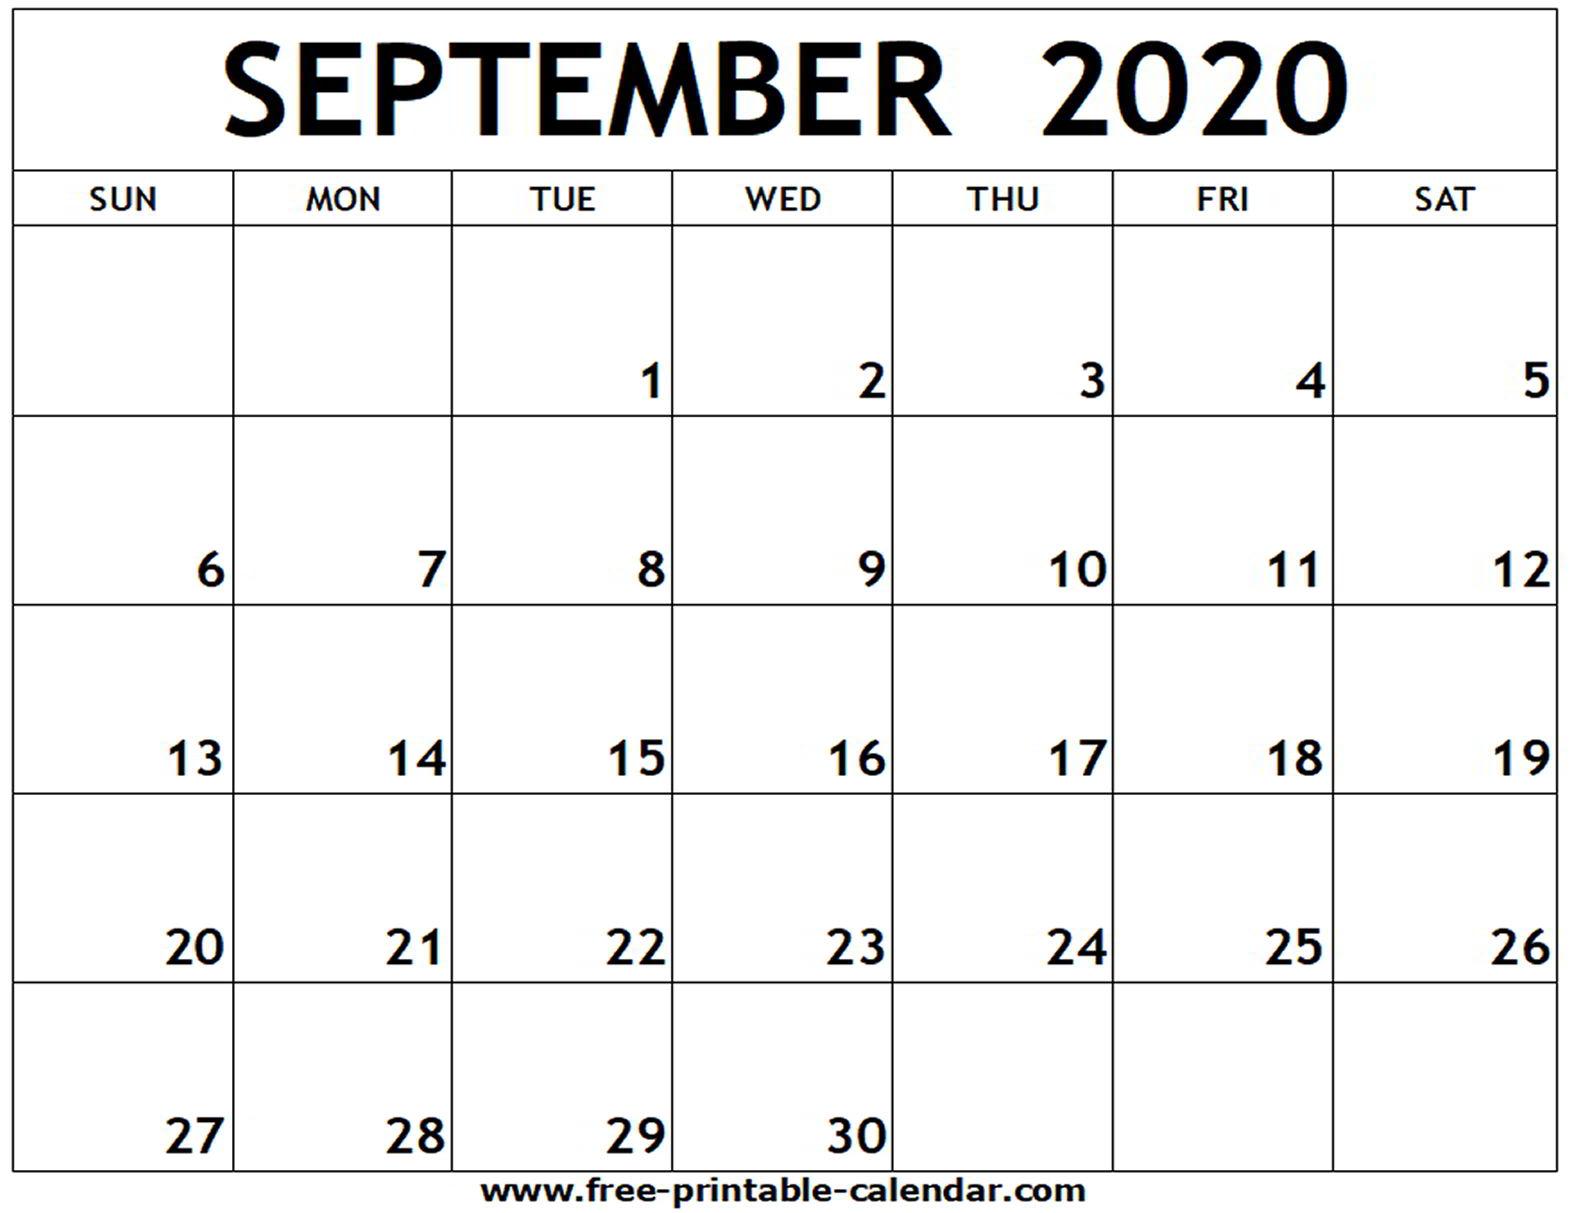 September 2020 Printable Calendar - Free-Printable-Calendar